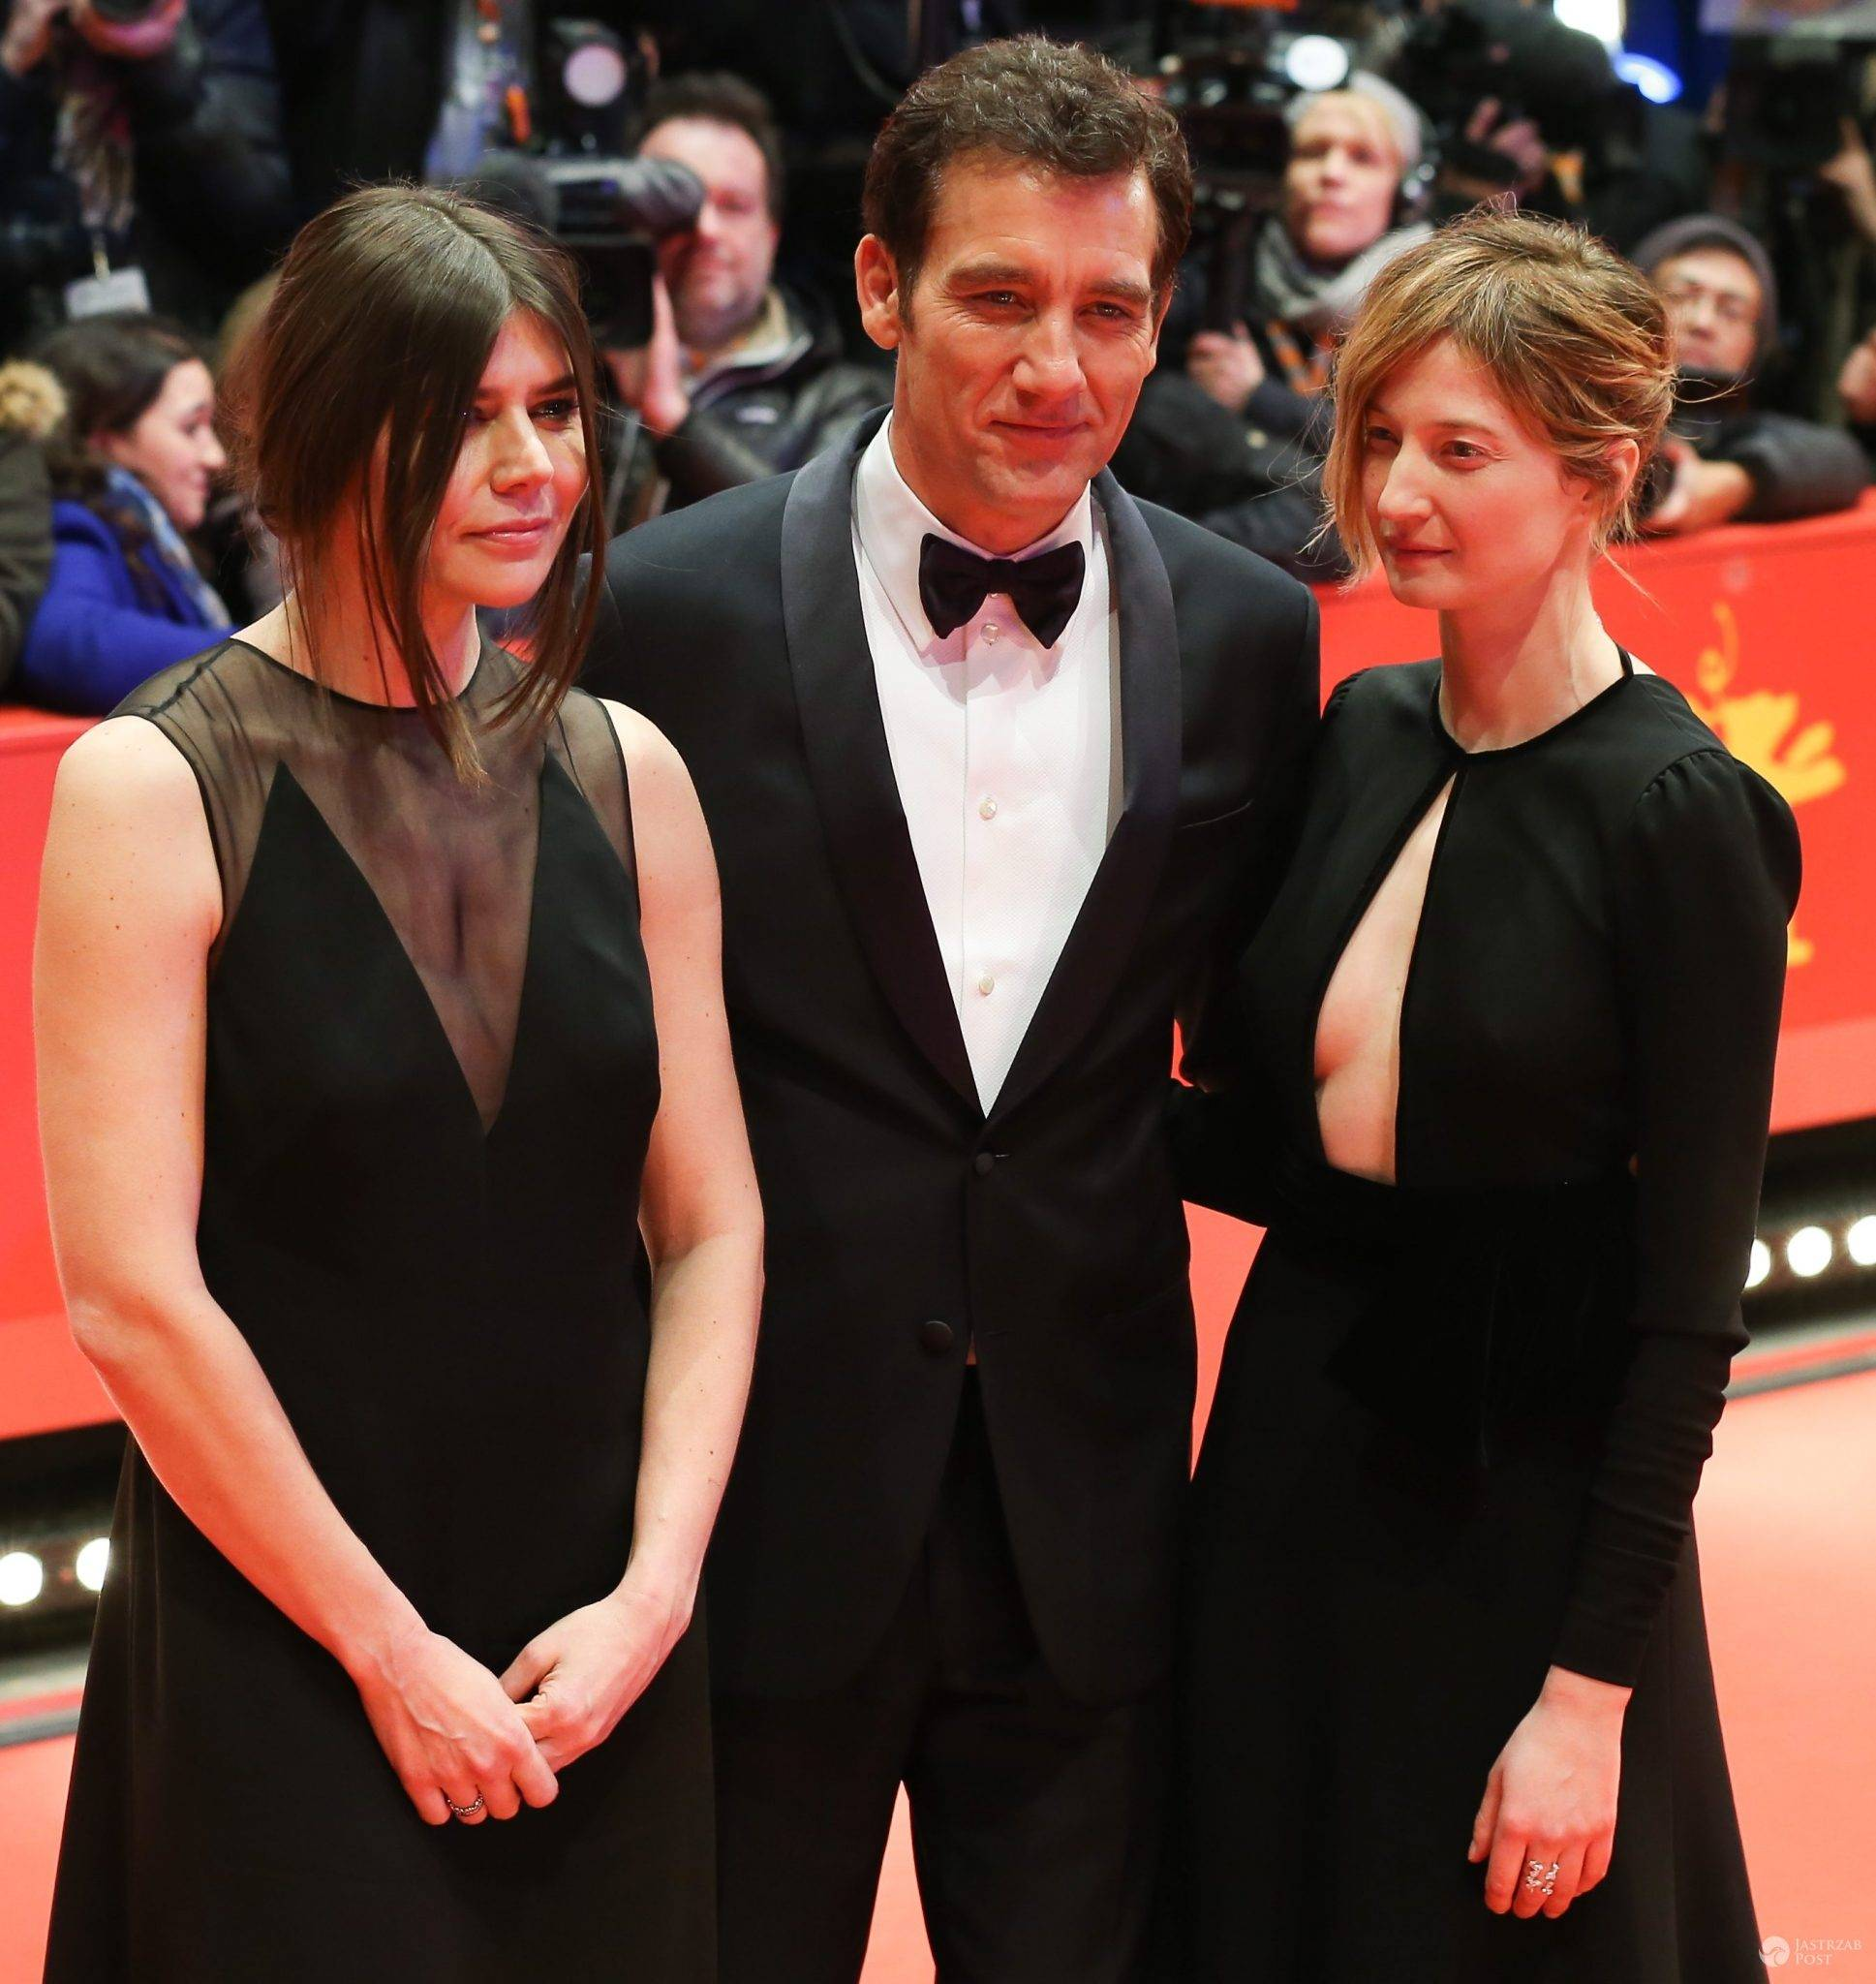 Malgorzata Szumowska, Clive Owen i Alba Rohrwacher, otwarcie festiwalu filmowego Berlinale 2016 (fot. ONS)